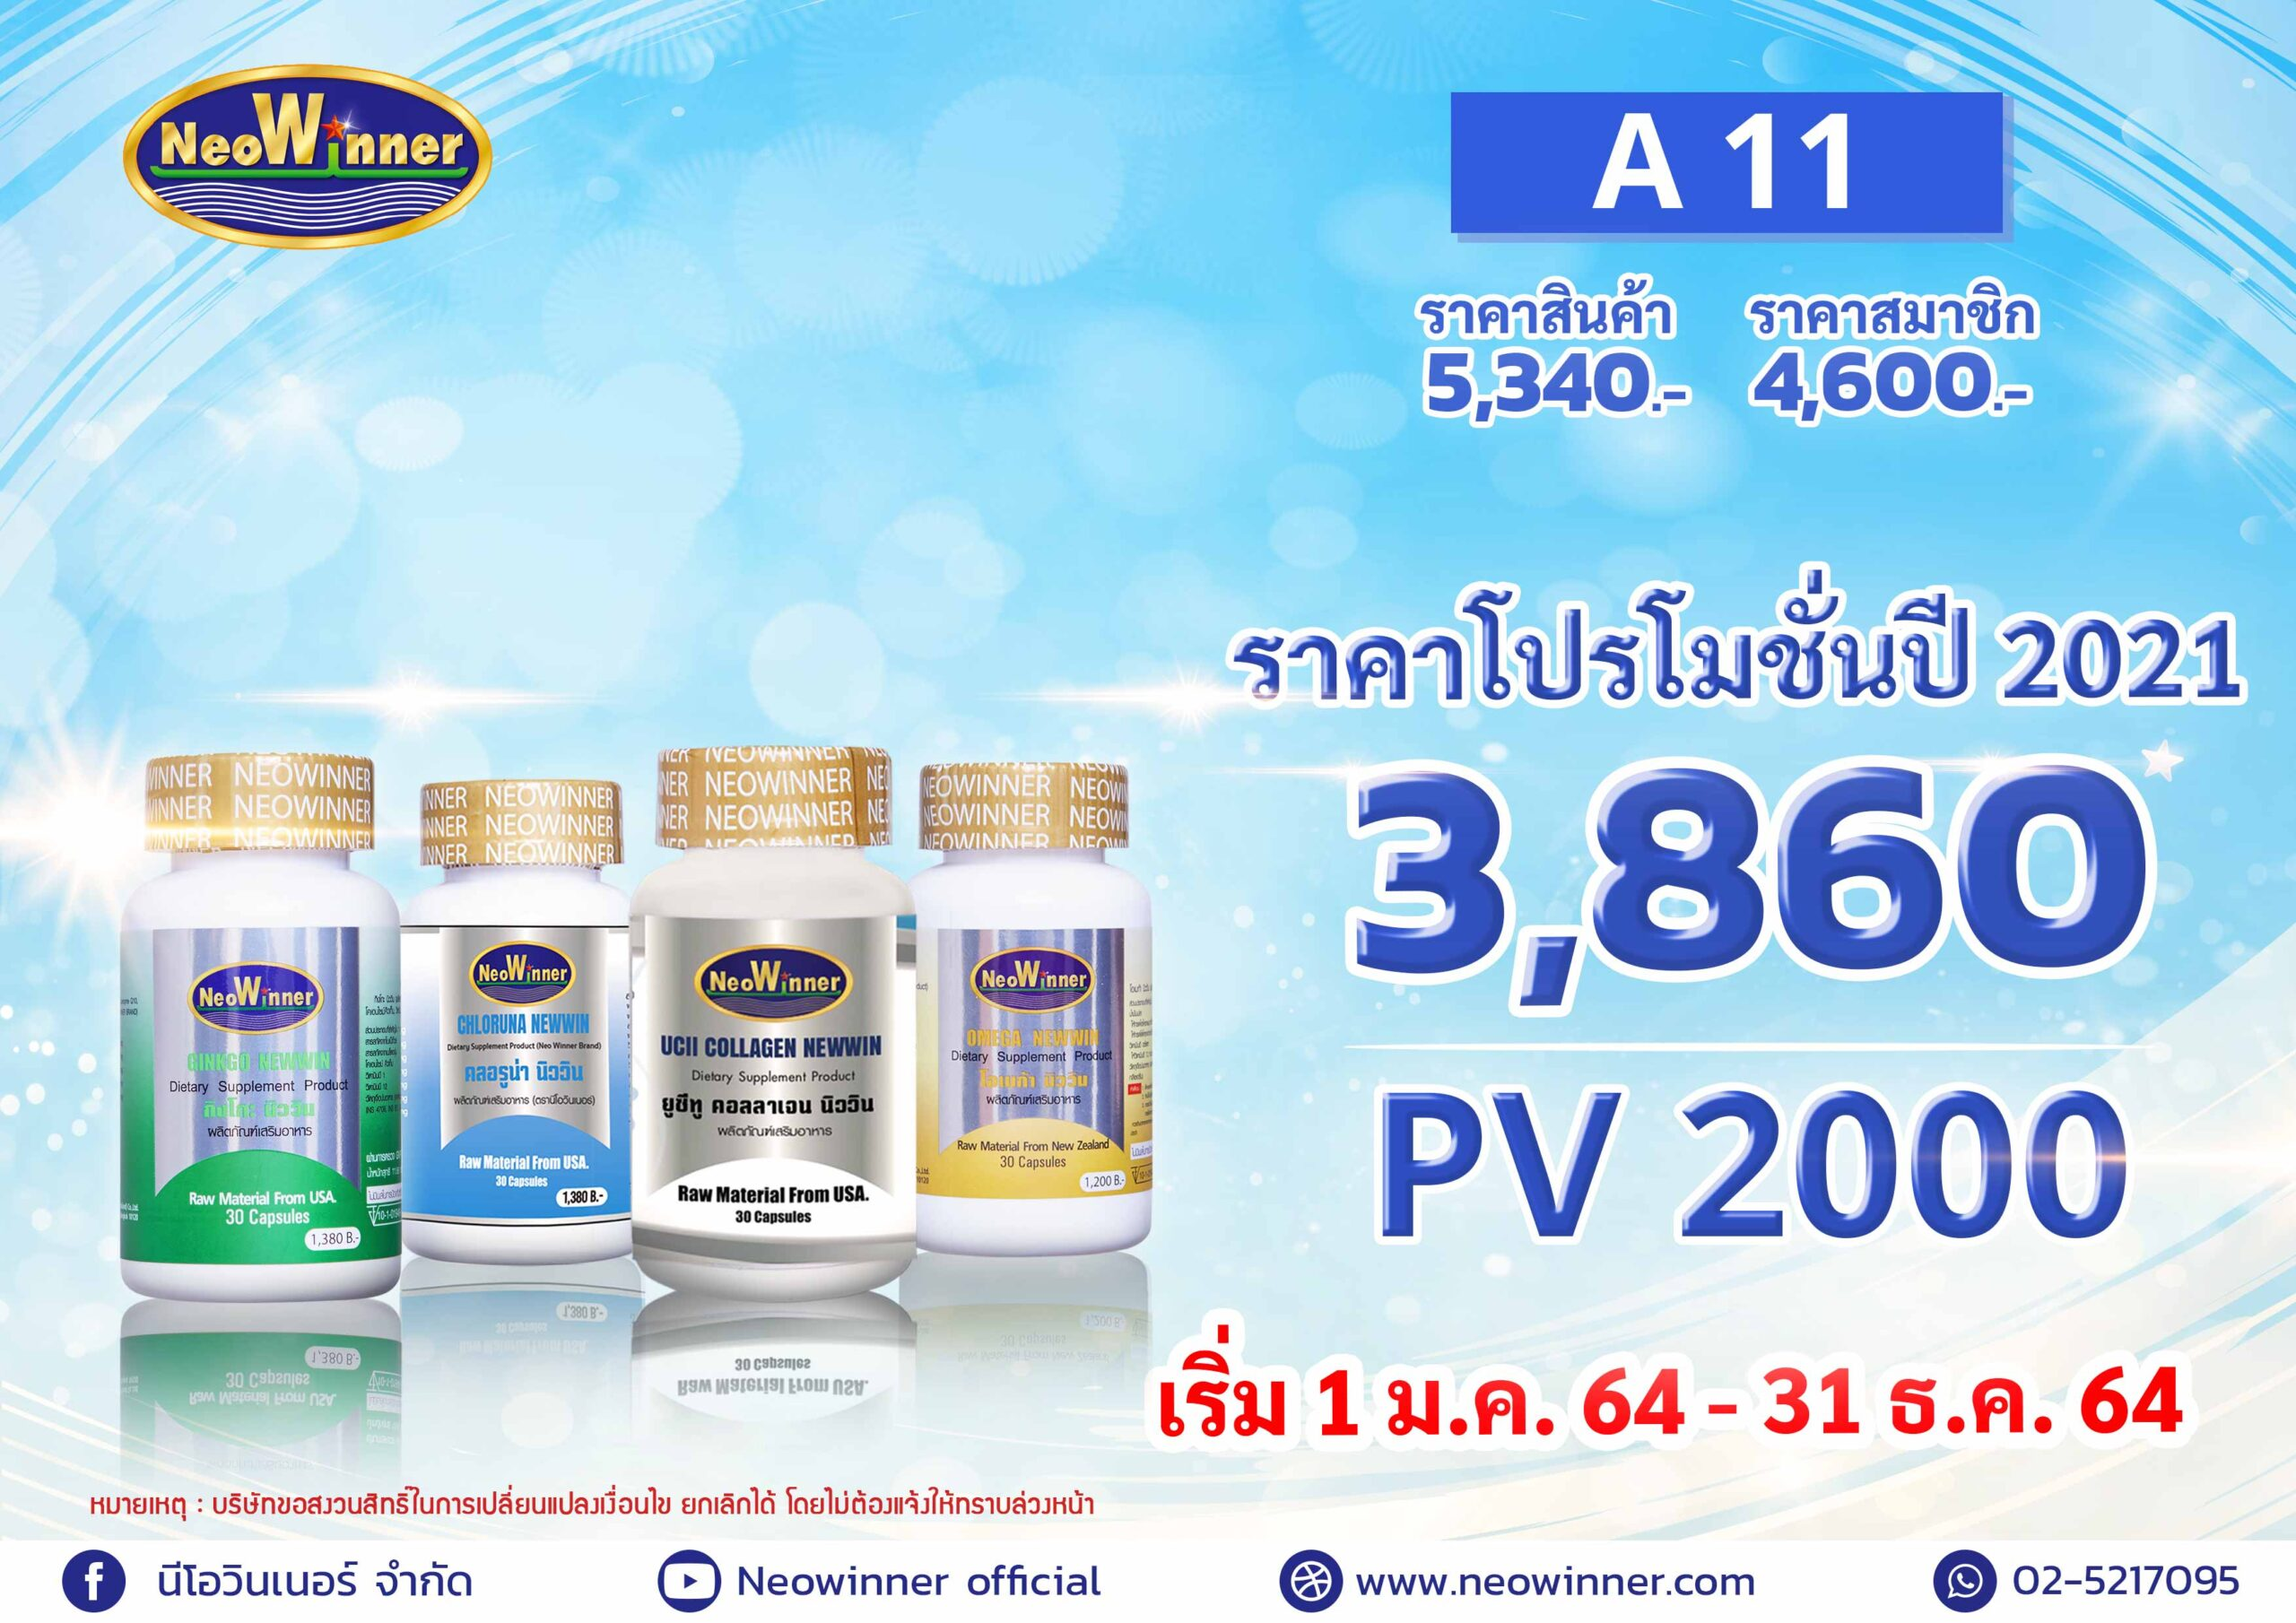 Promotion-A-11-2021